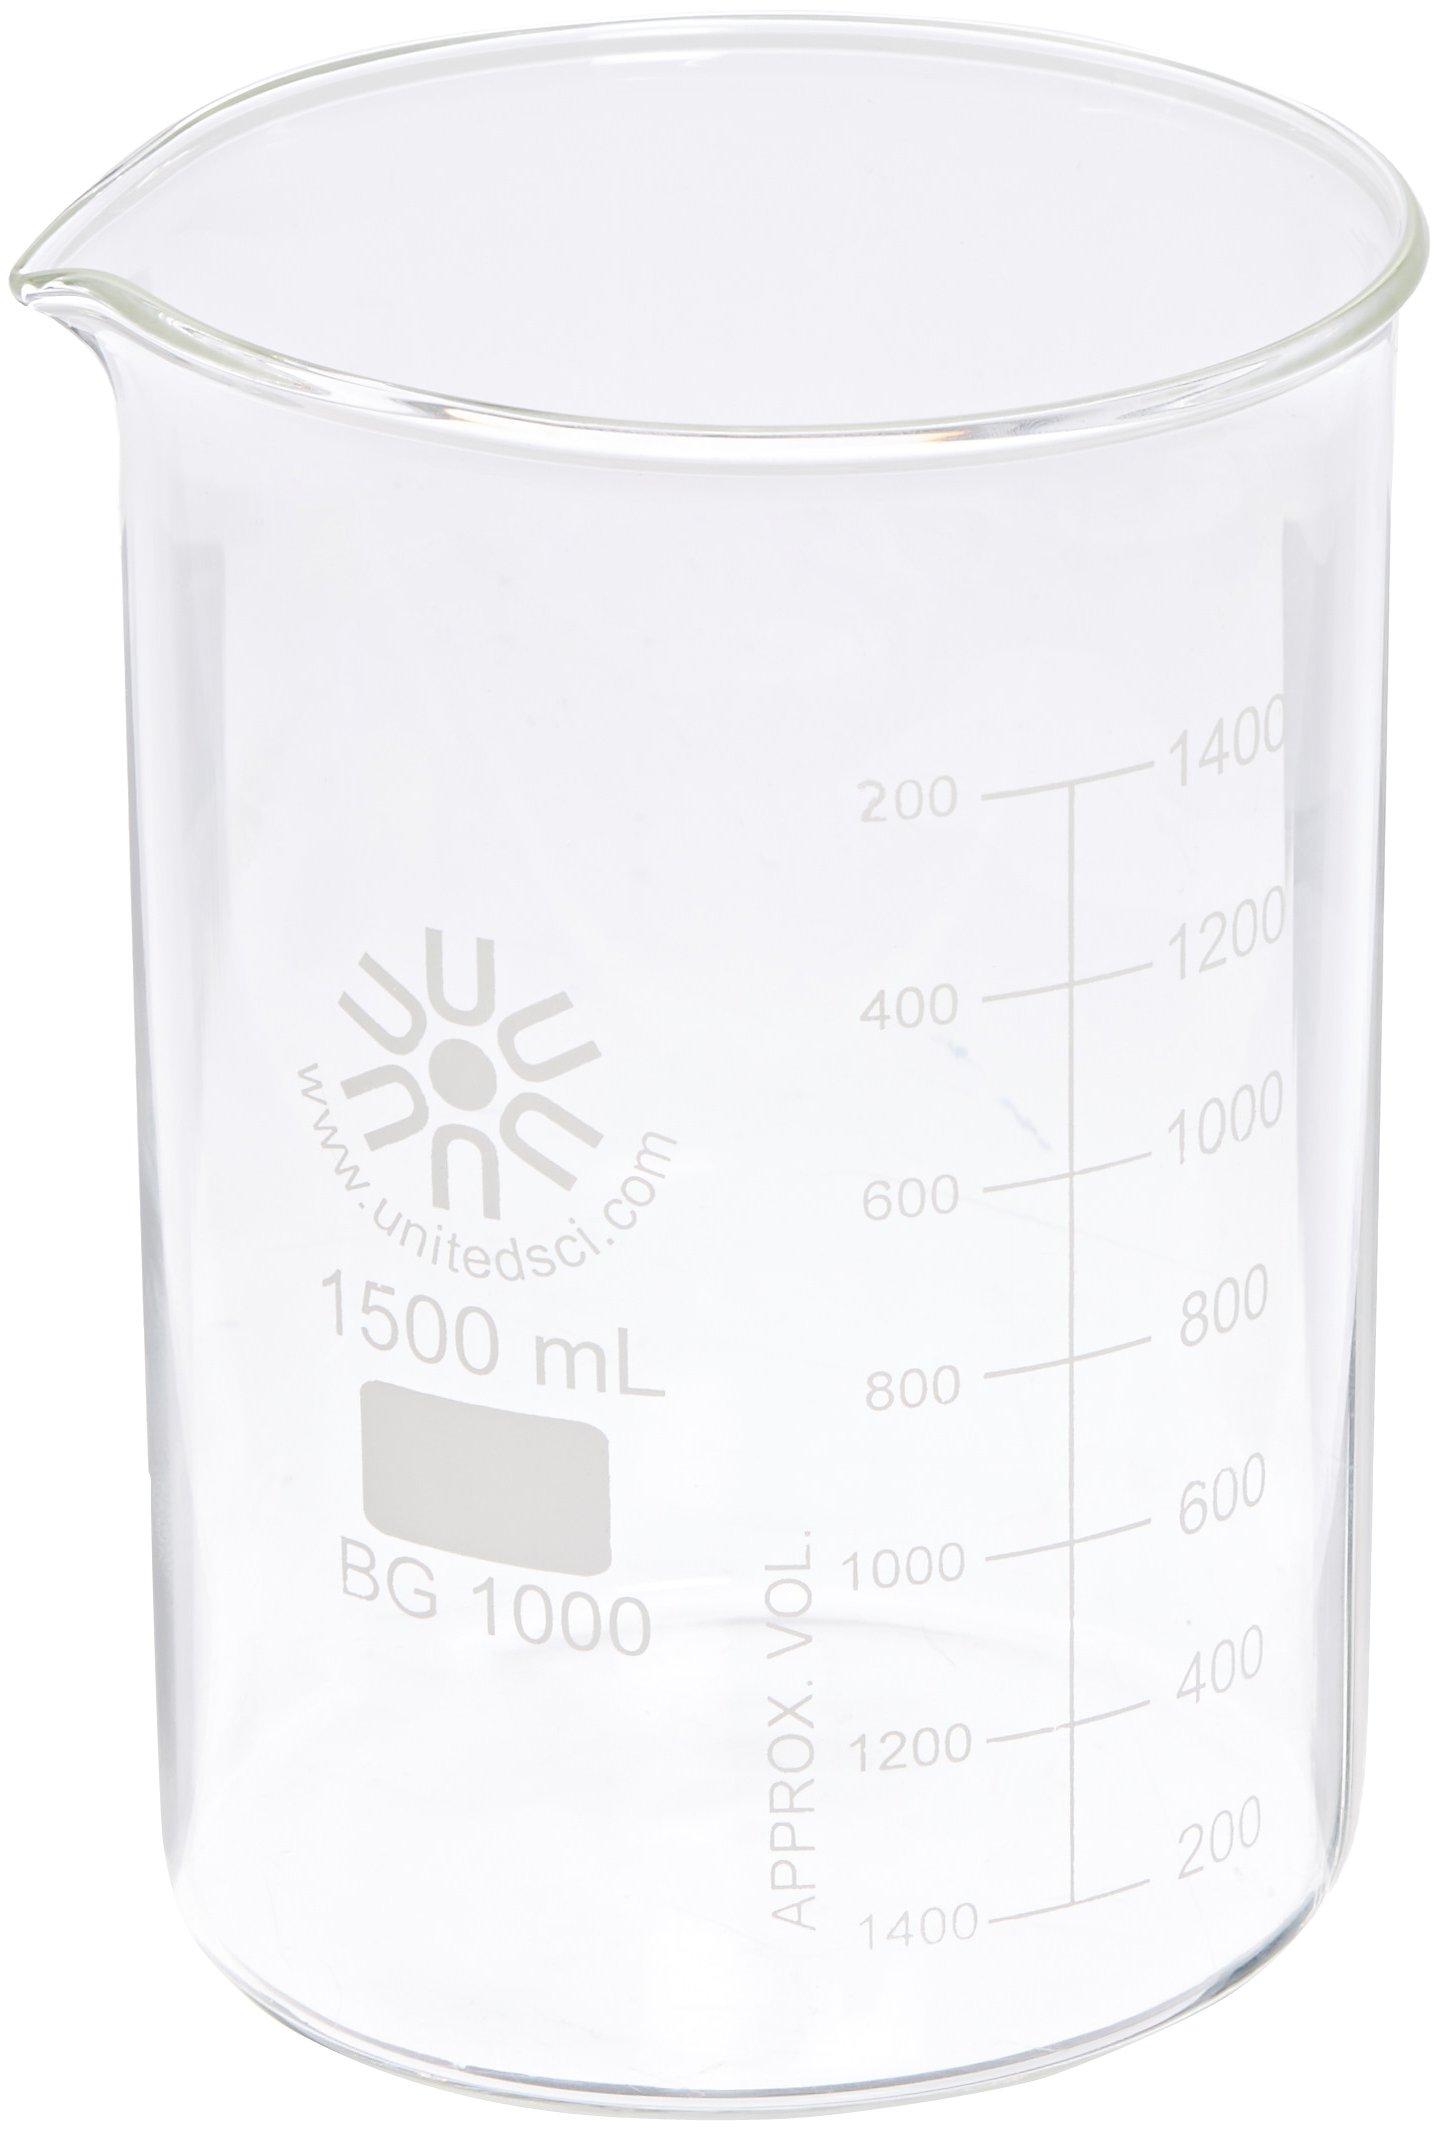 United Scientific BG1000-1500 Borosilicate Glass Low Form Beaker, 1500ml Capacity (Pack of 4)